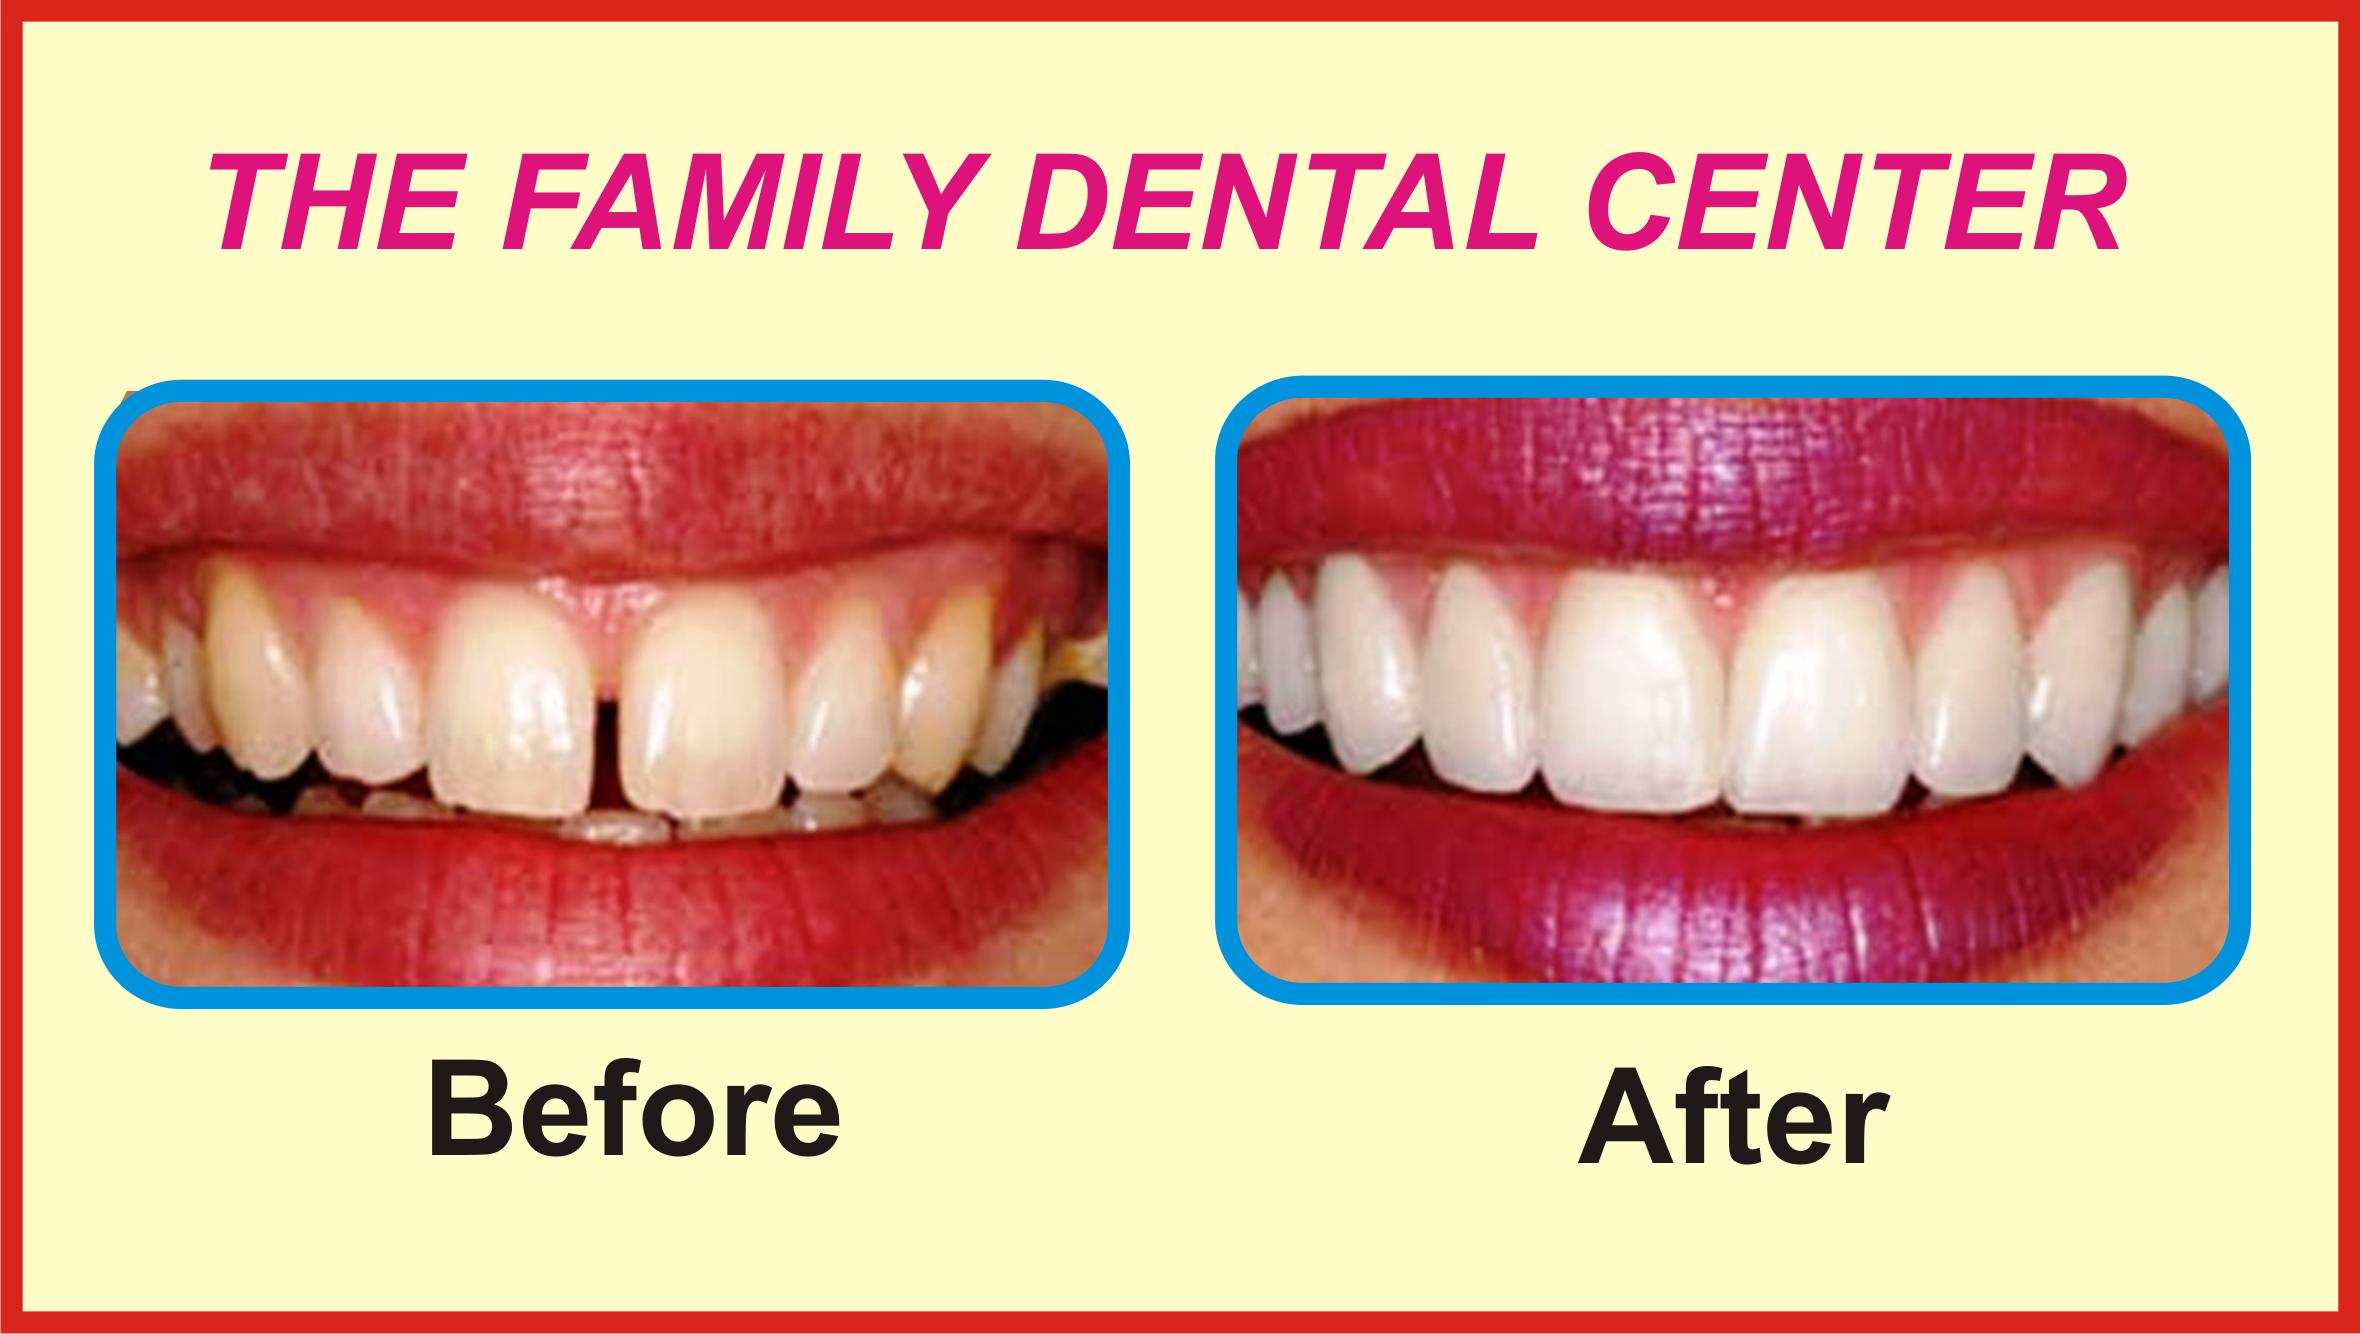 contact the family dental center